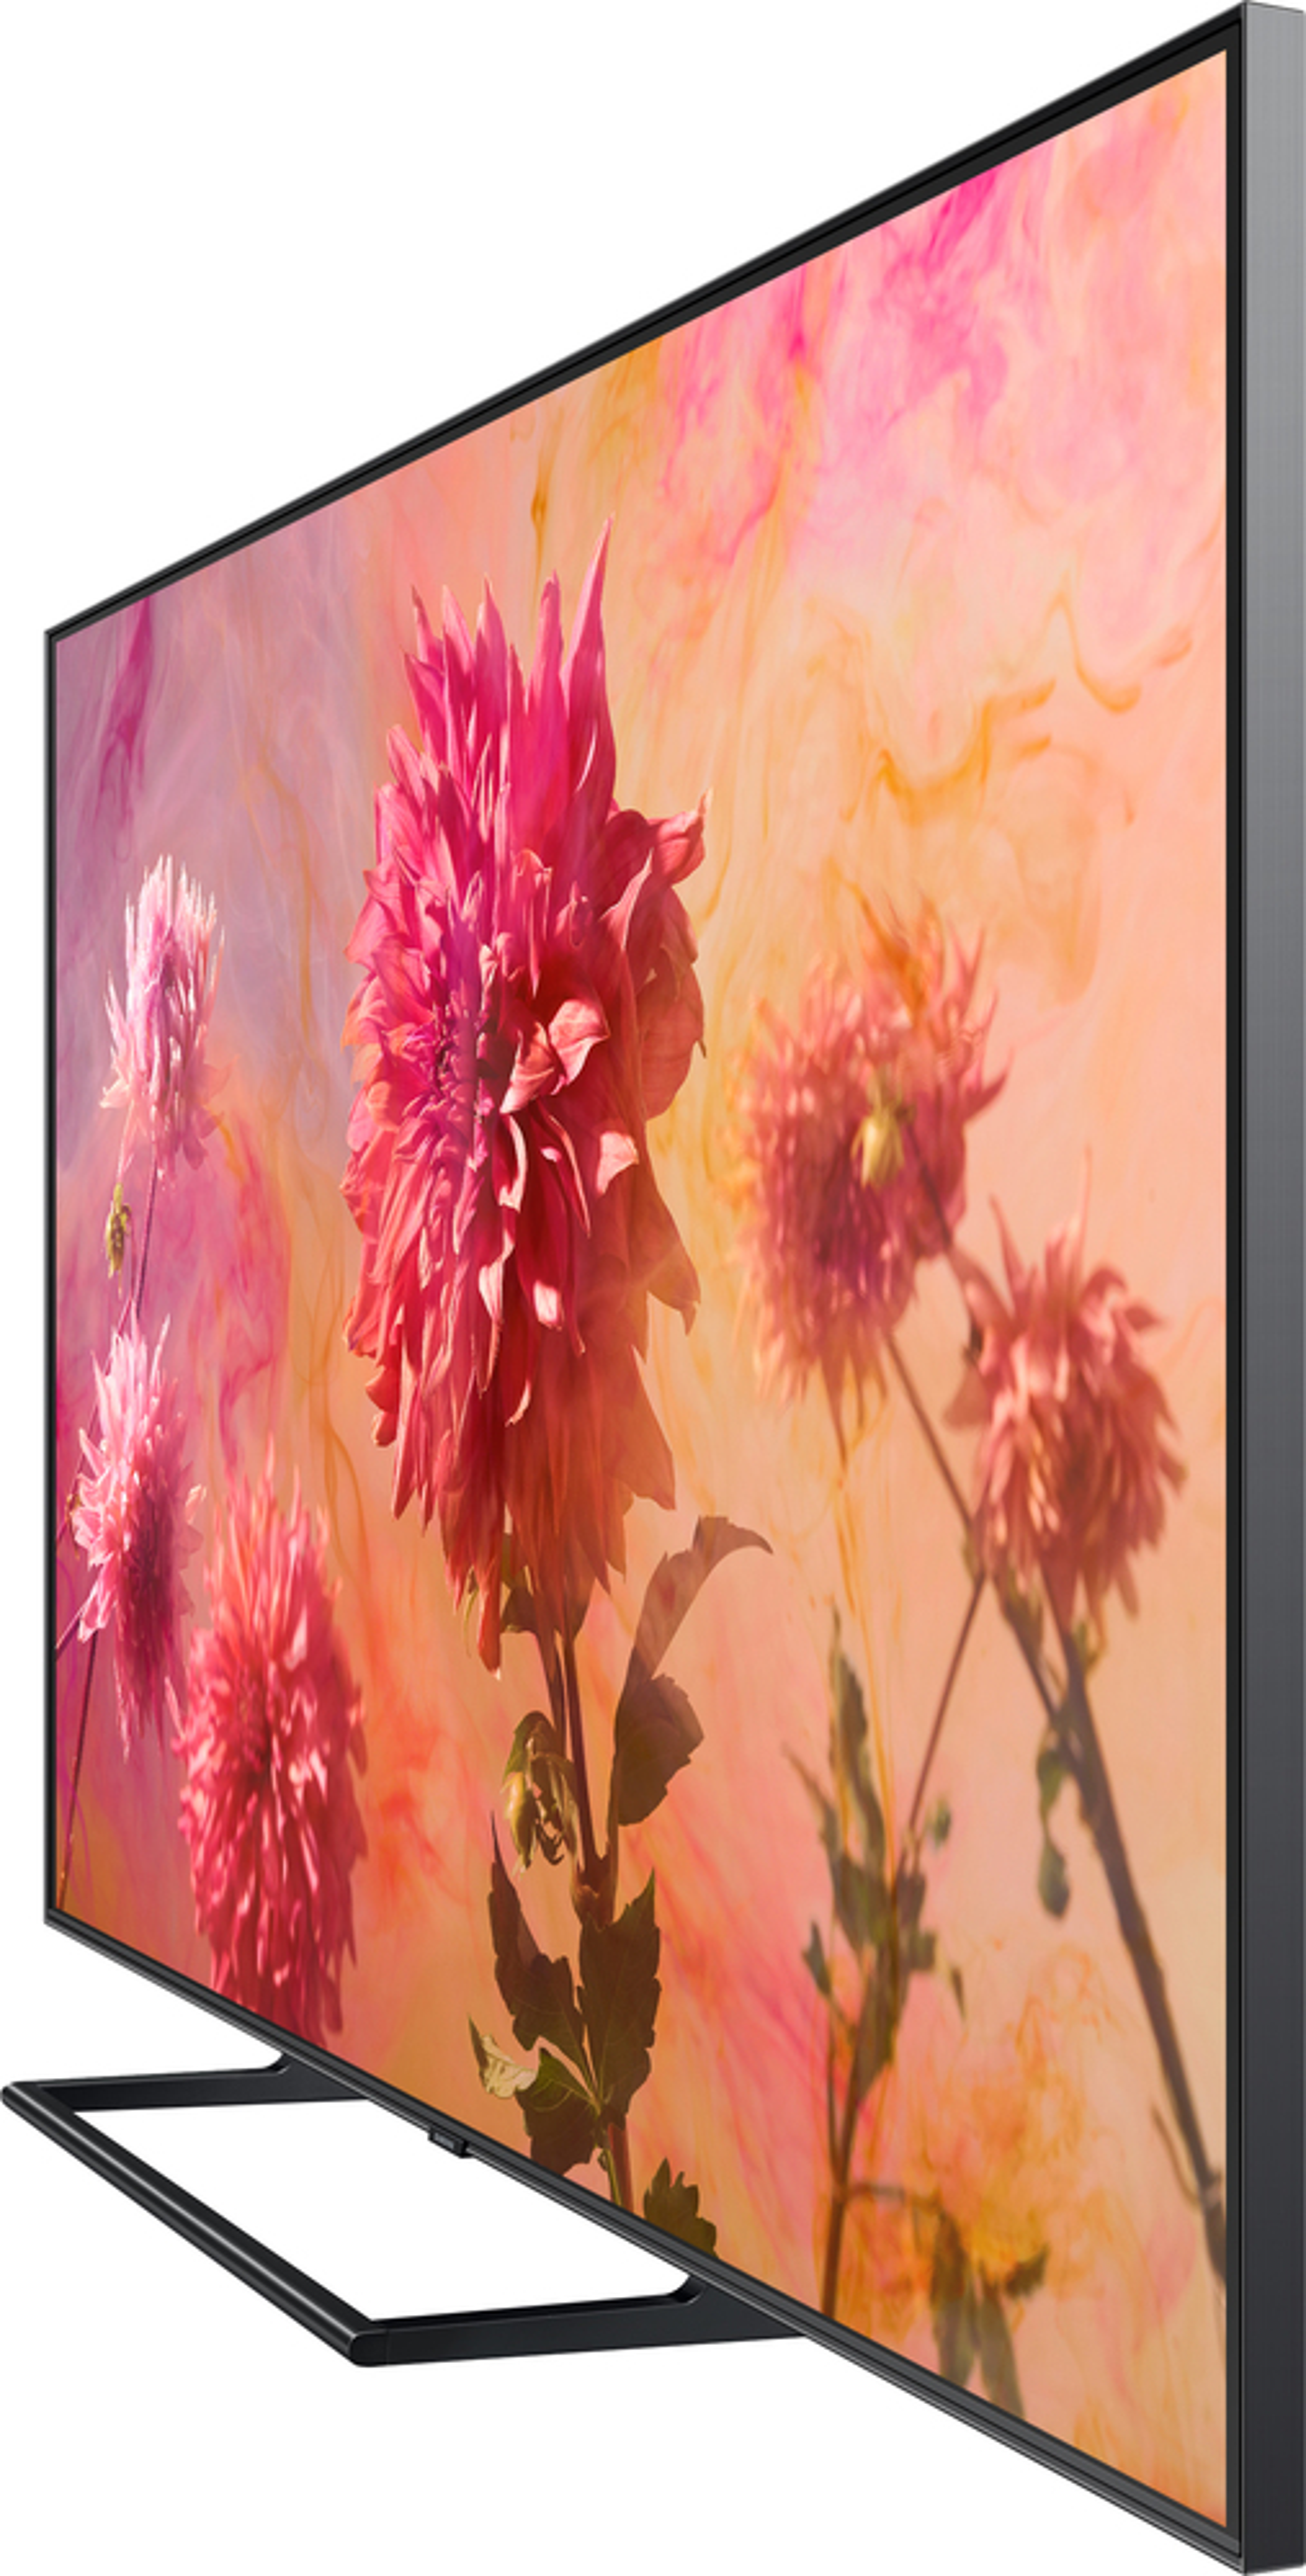 Image 3 for Samsung QN75Q9FNAFXZA